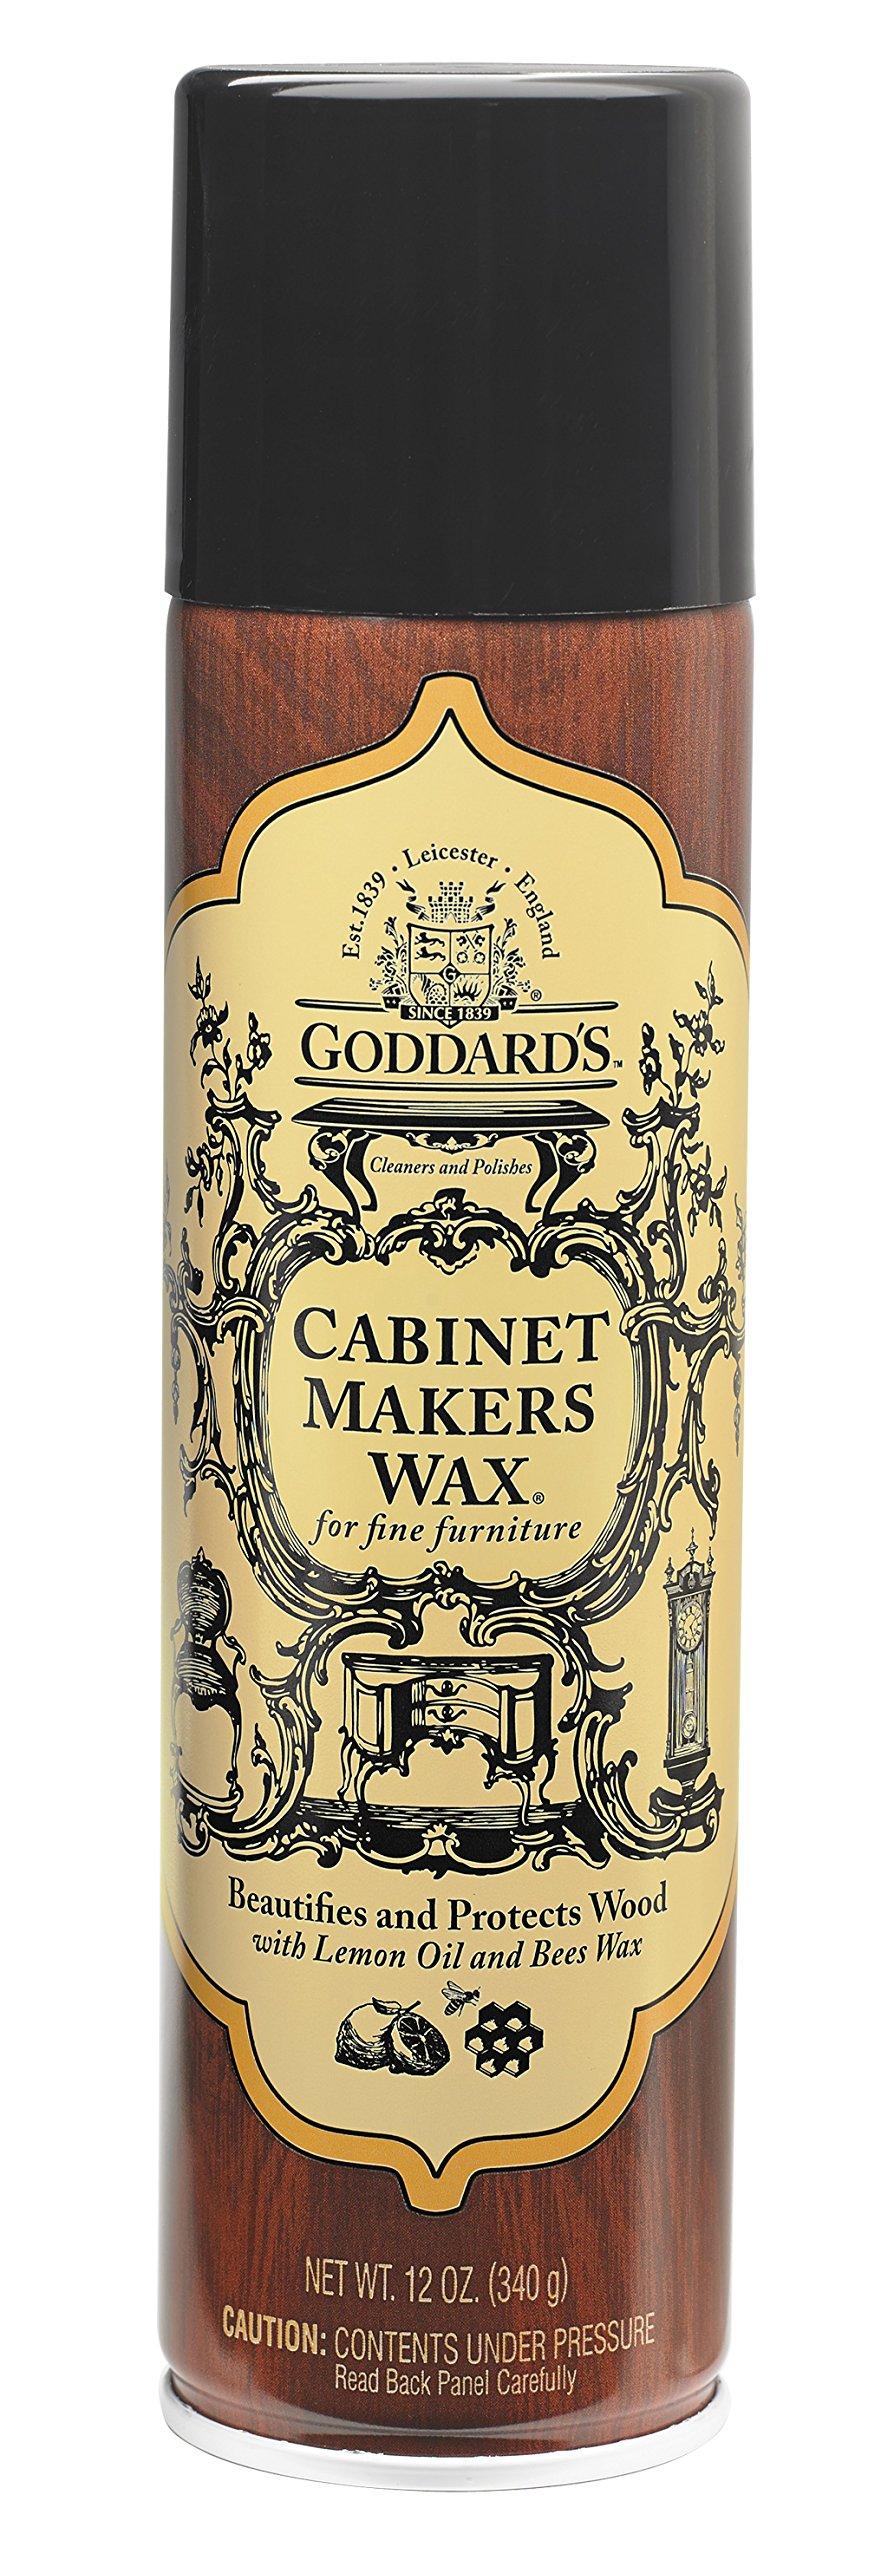 Goddard's Cabinet Makers Fine Aerosol Wax Spray Can - for Wood Furniture - 12 oz.